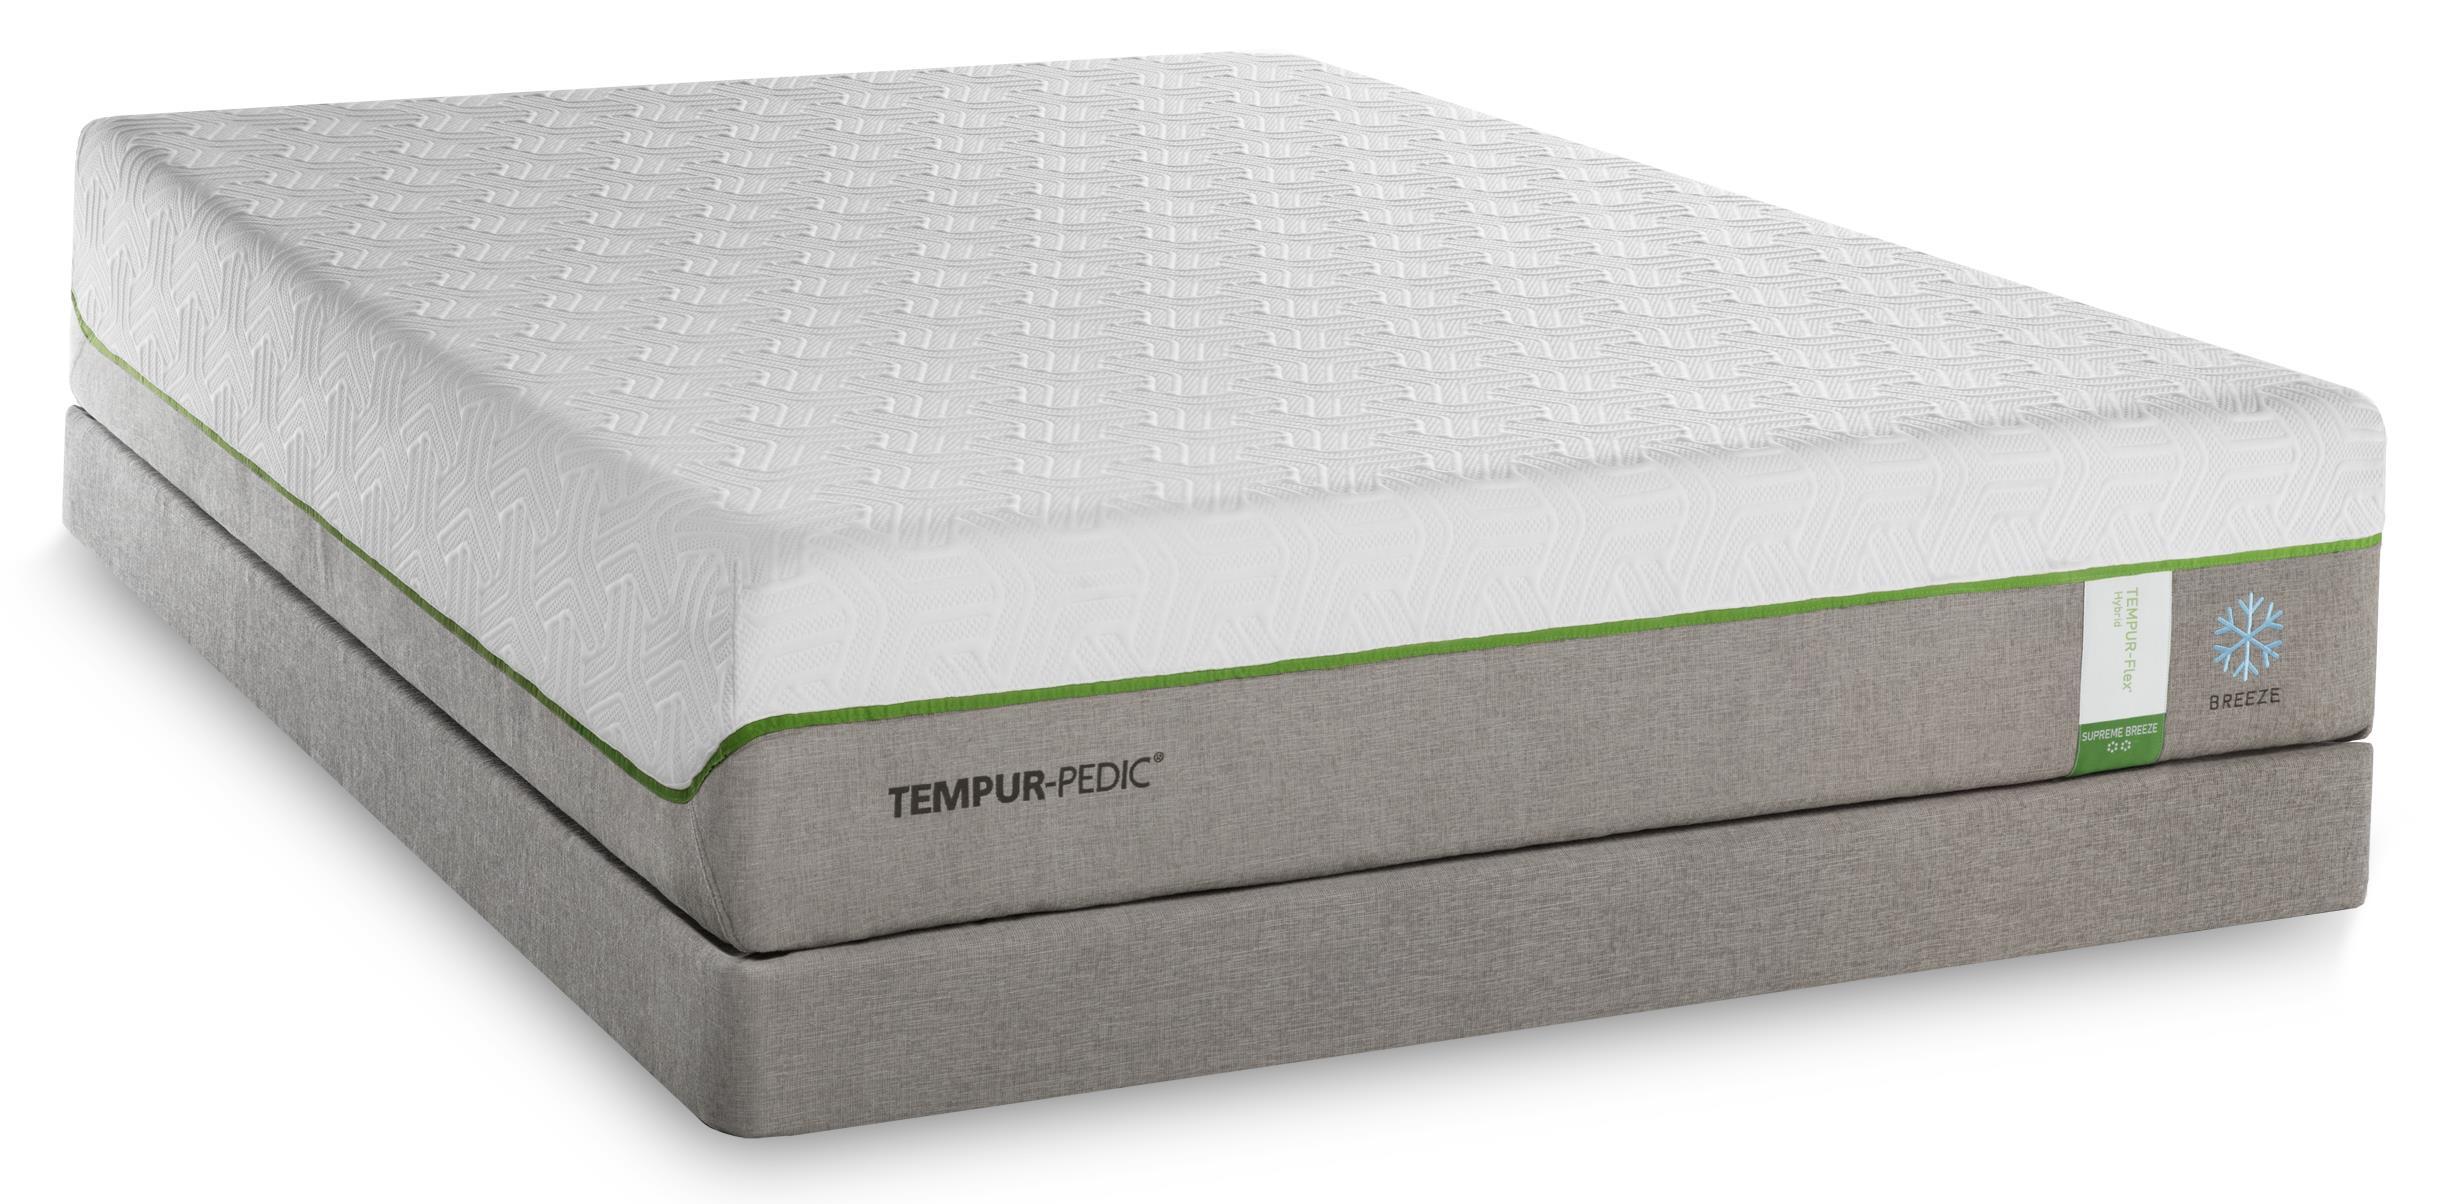 Tempur-Pedic® TEMPUR-Flex Supreme Breeze Split King Medium Plush Adjustable Set - Item Number: 2x10292220+2x25289220